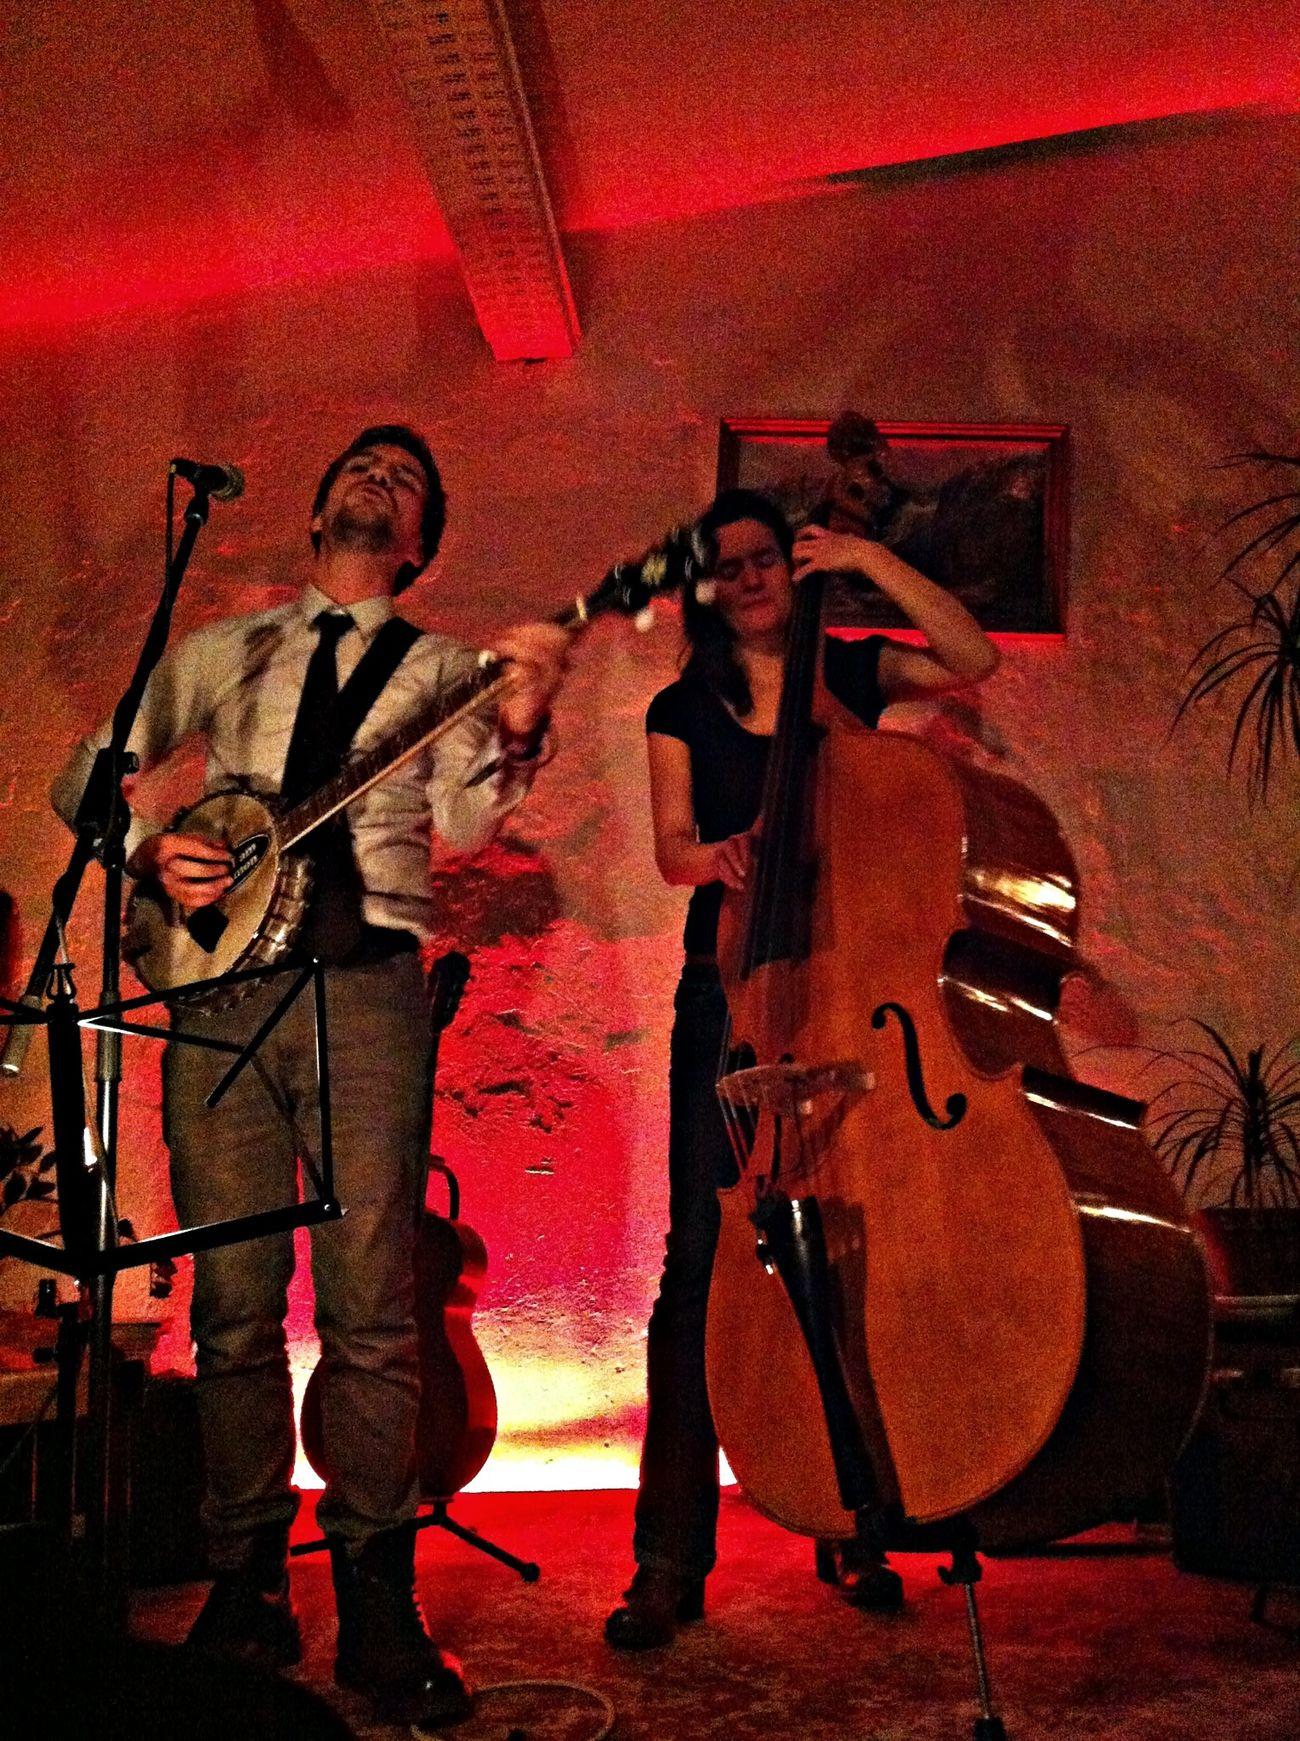 Concert Banjo Contrabass Live Music